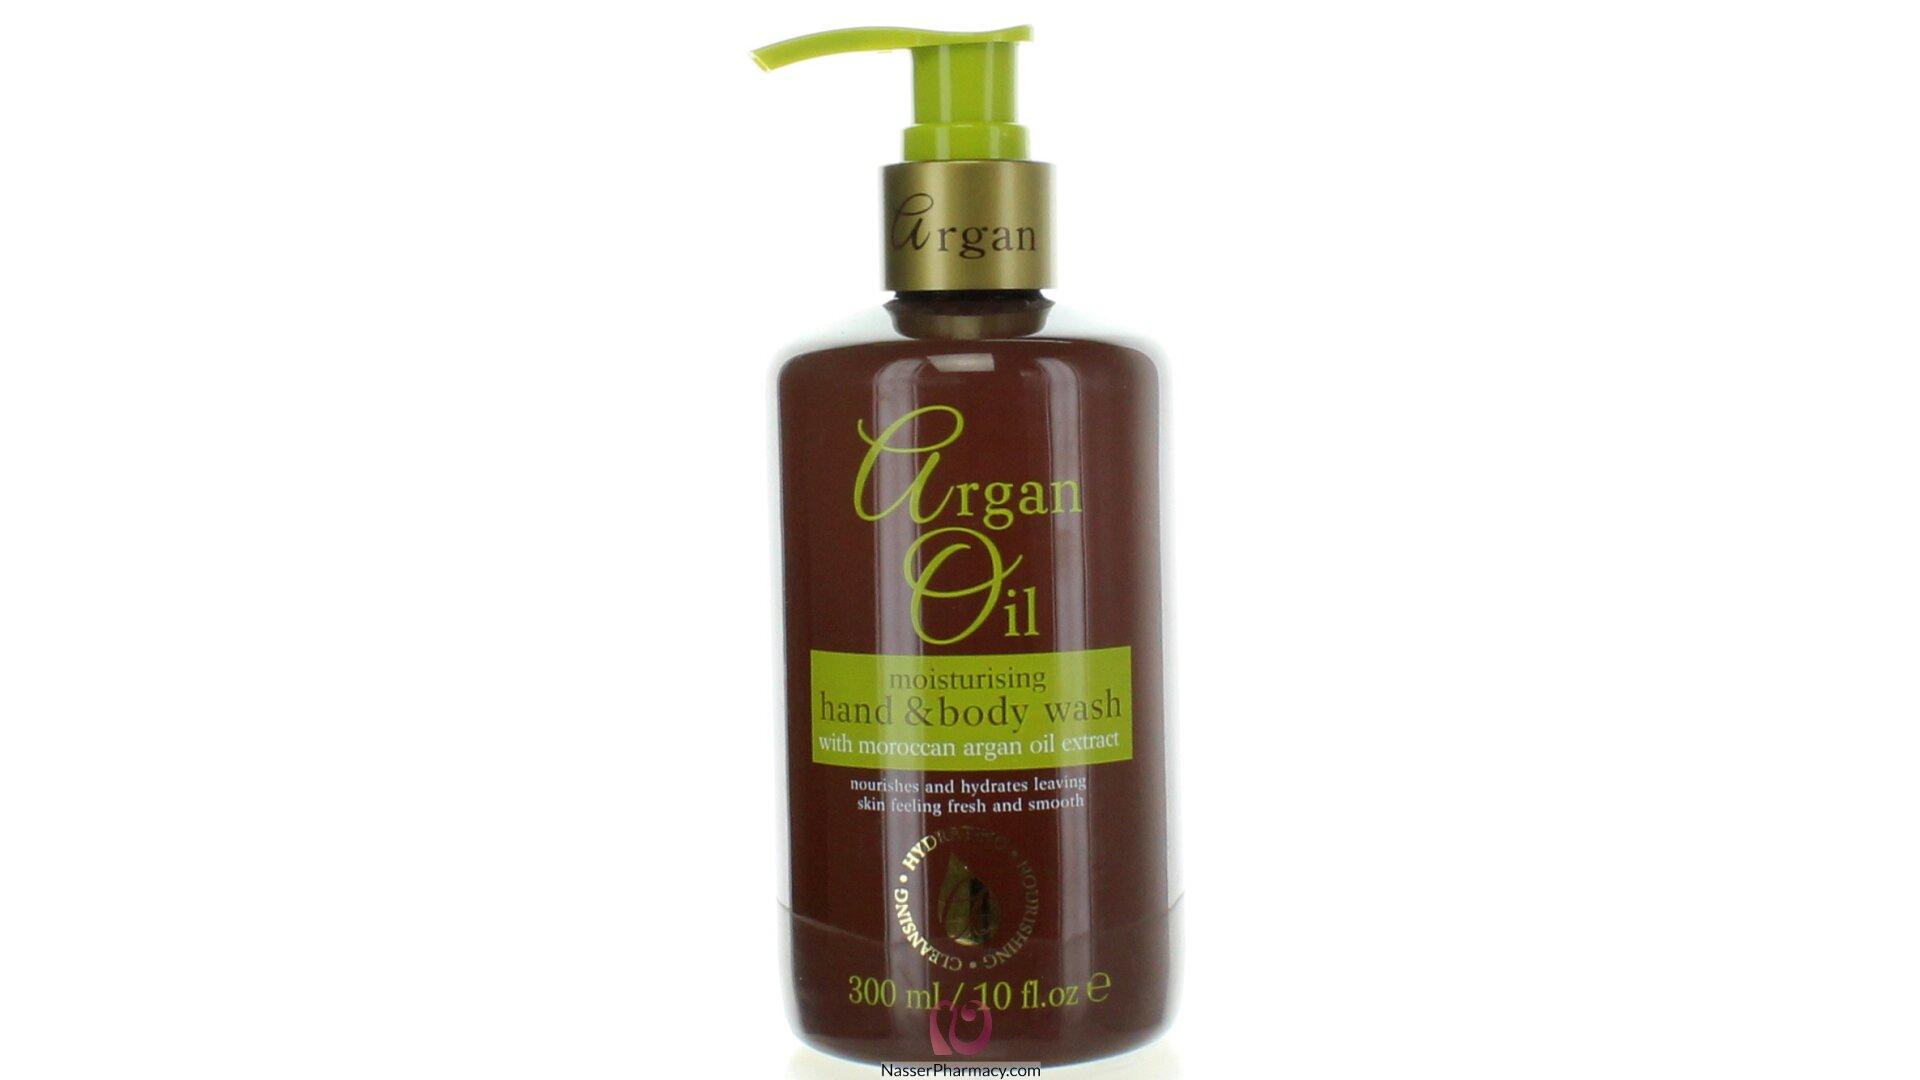 Https Bh En Bath Amp Shower Weekly 07 Cussons Baby Liquid Cleanser 300 100ml Argan Oil Moisturising Hand And Body Wash 300ml 53518 1920x1080